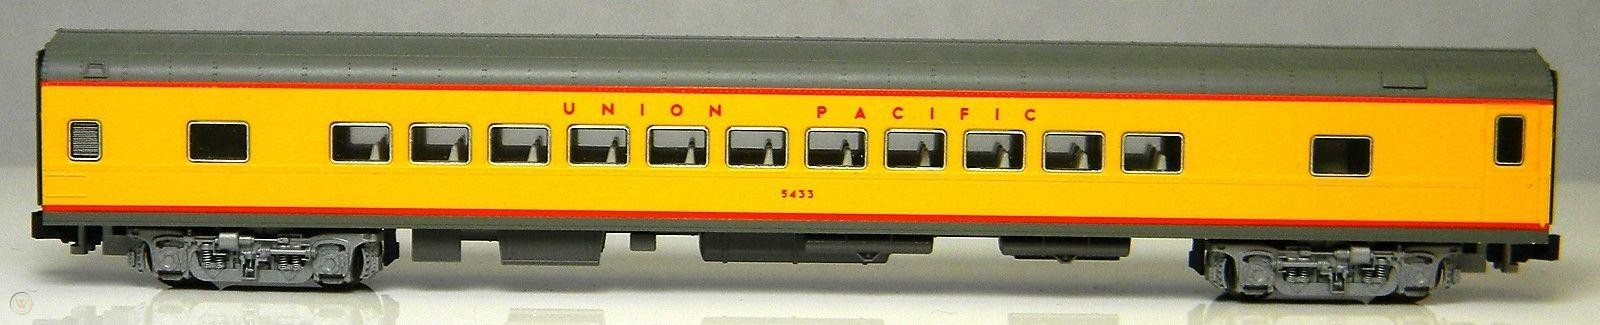 N Scale - Kato USA - 106-1101-B - Passenger Car, Lightweight, Pullman, Coach, 44-Seat - Union Pacific - 5433